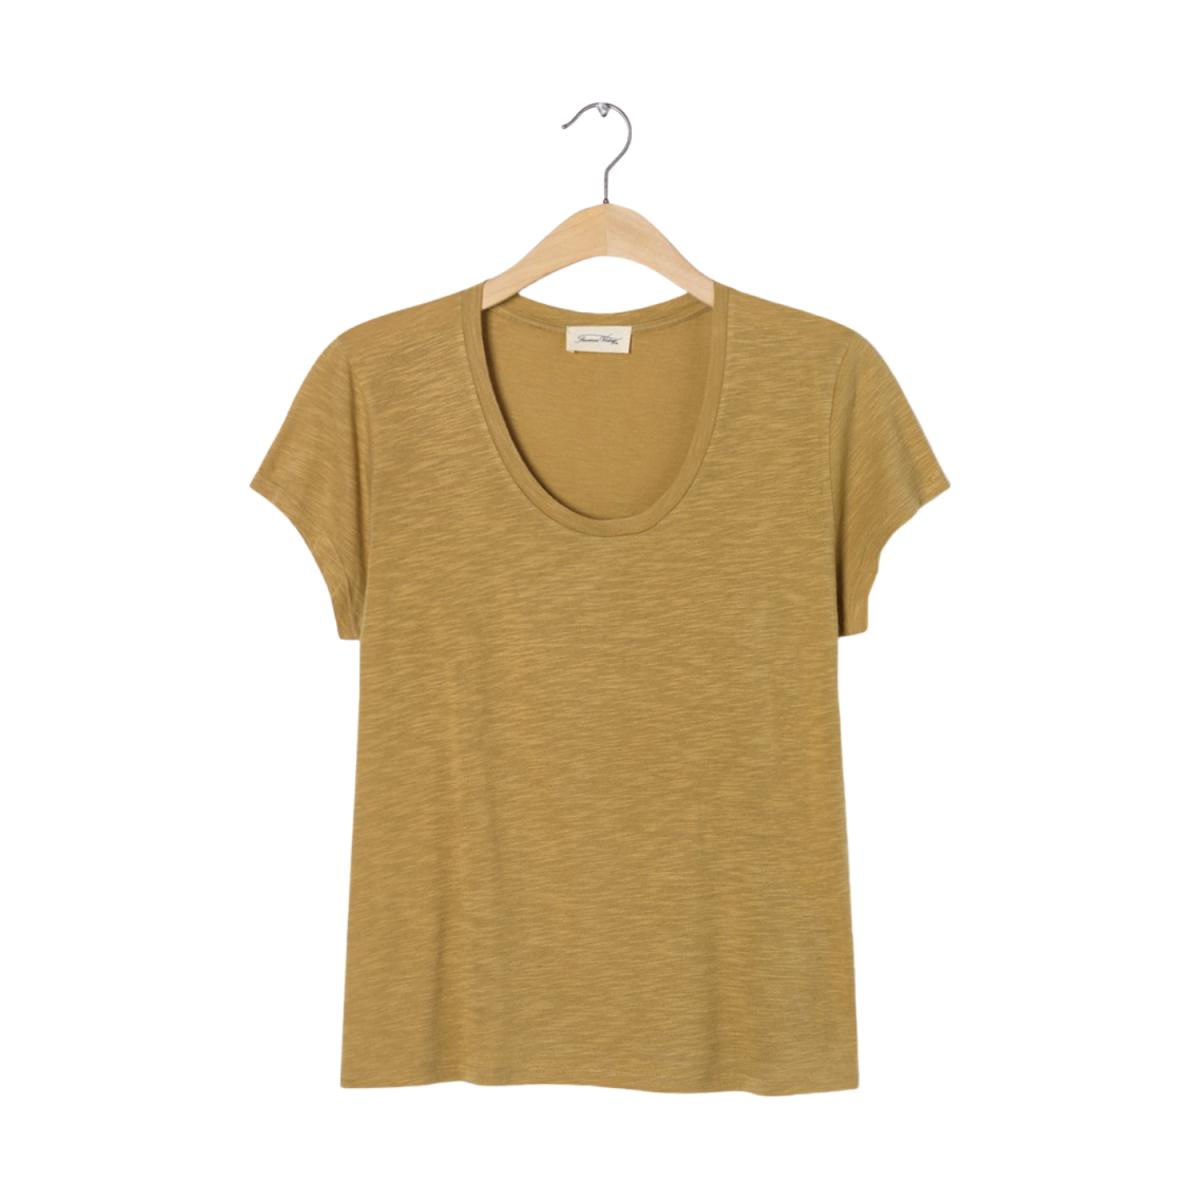 jacksonville t-shirt - vintage camello